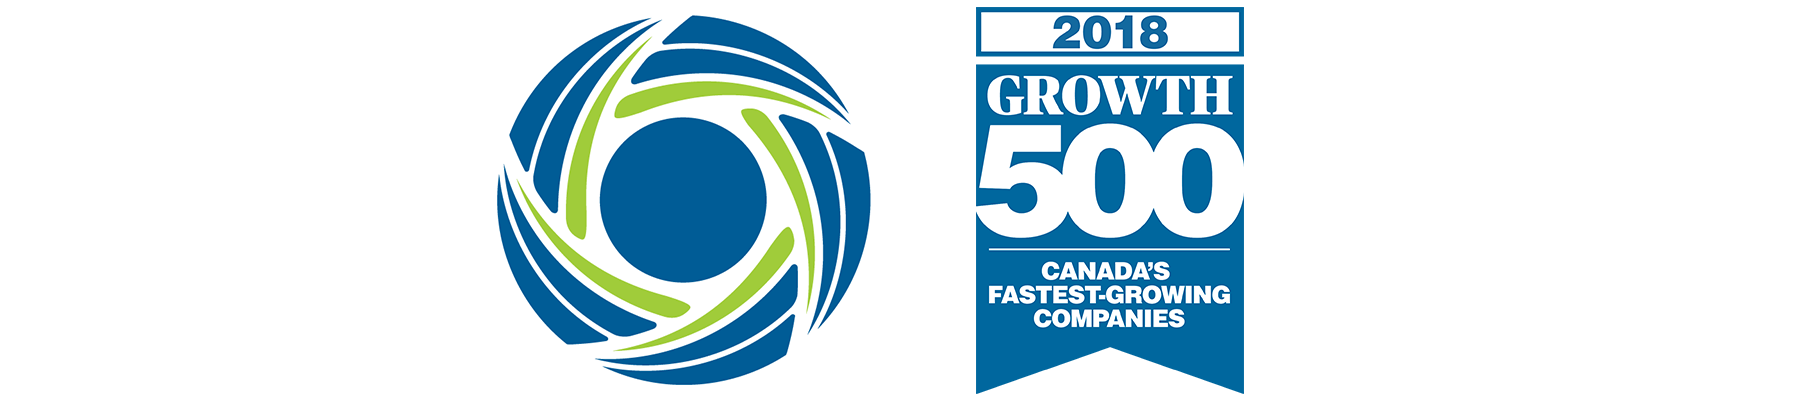 ConvergentIS Growth 500